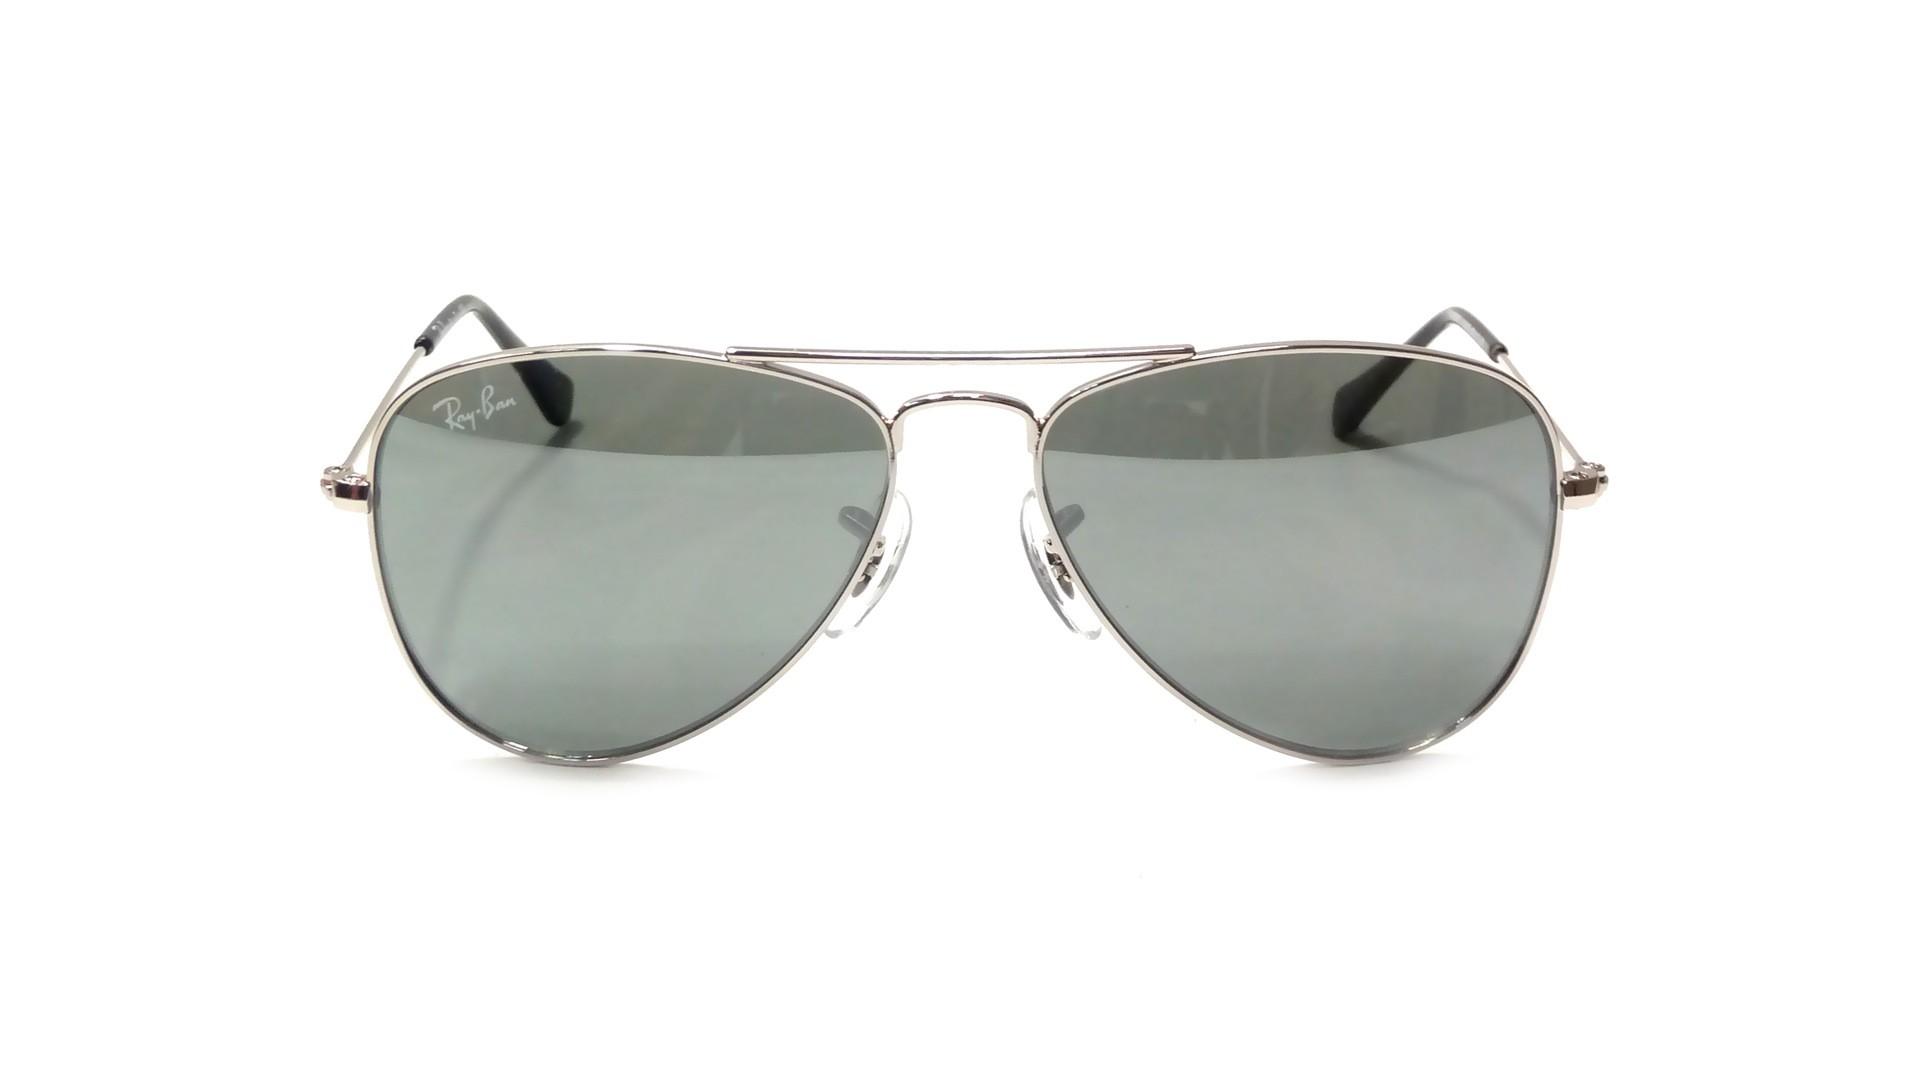 Ray ban aviator gris rj9506s 212 6g 50 13 prix 49 90 for Lunettes de soleil ray ban aviator miroir